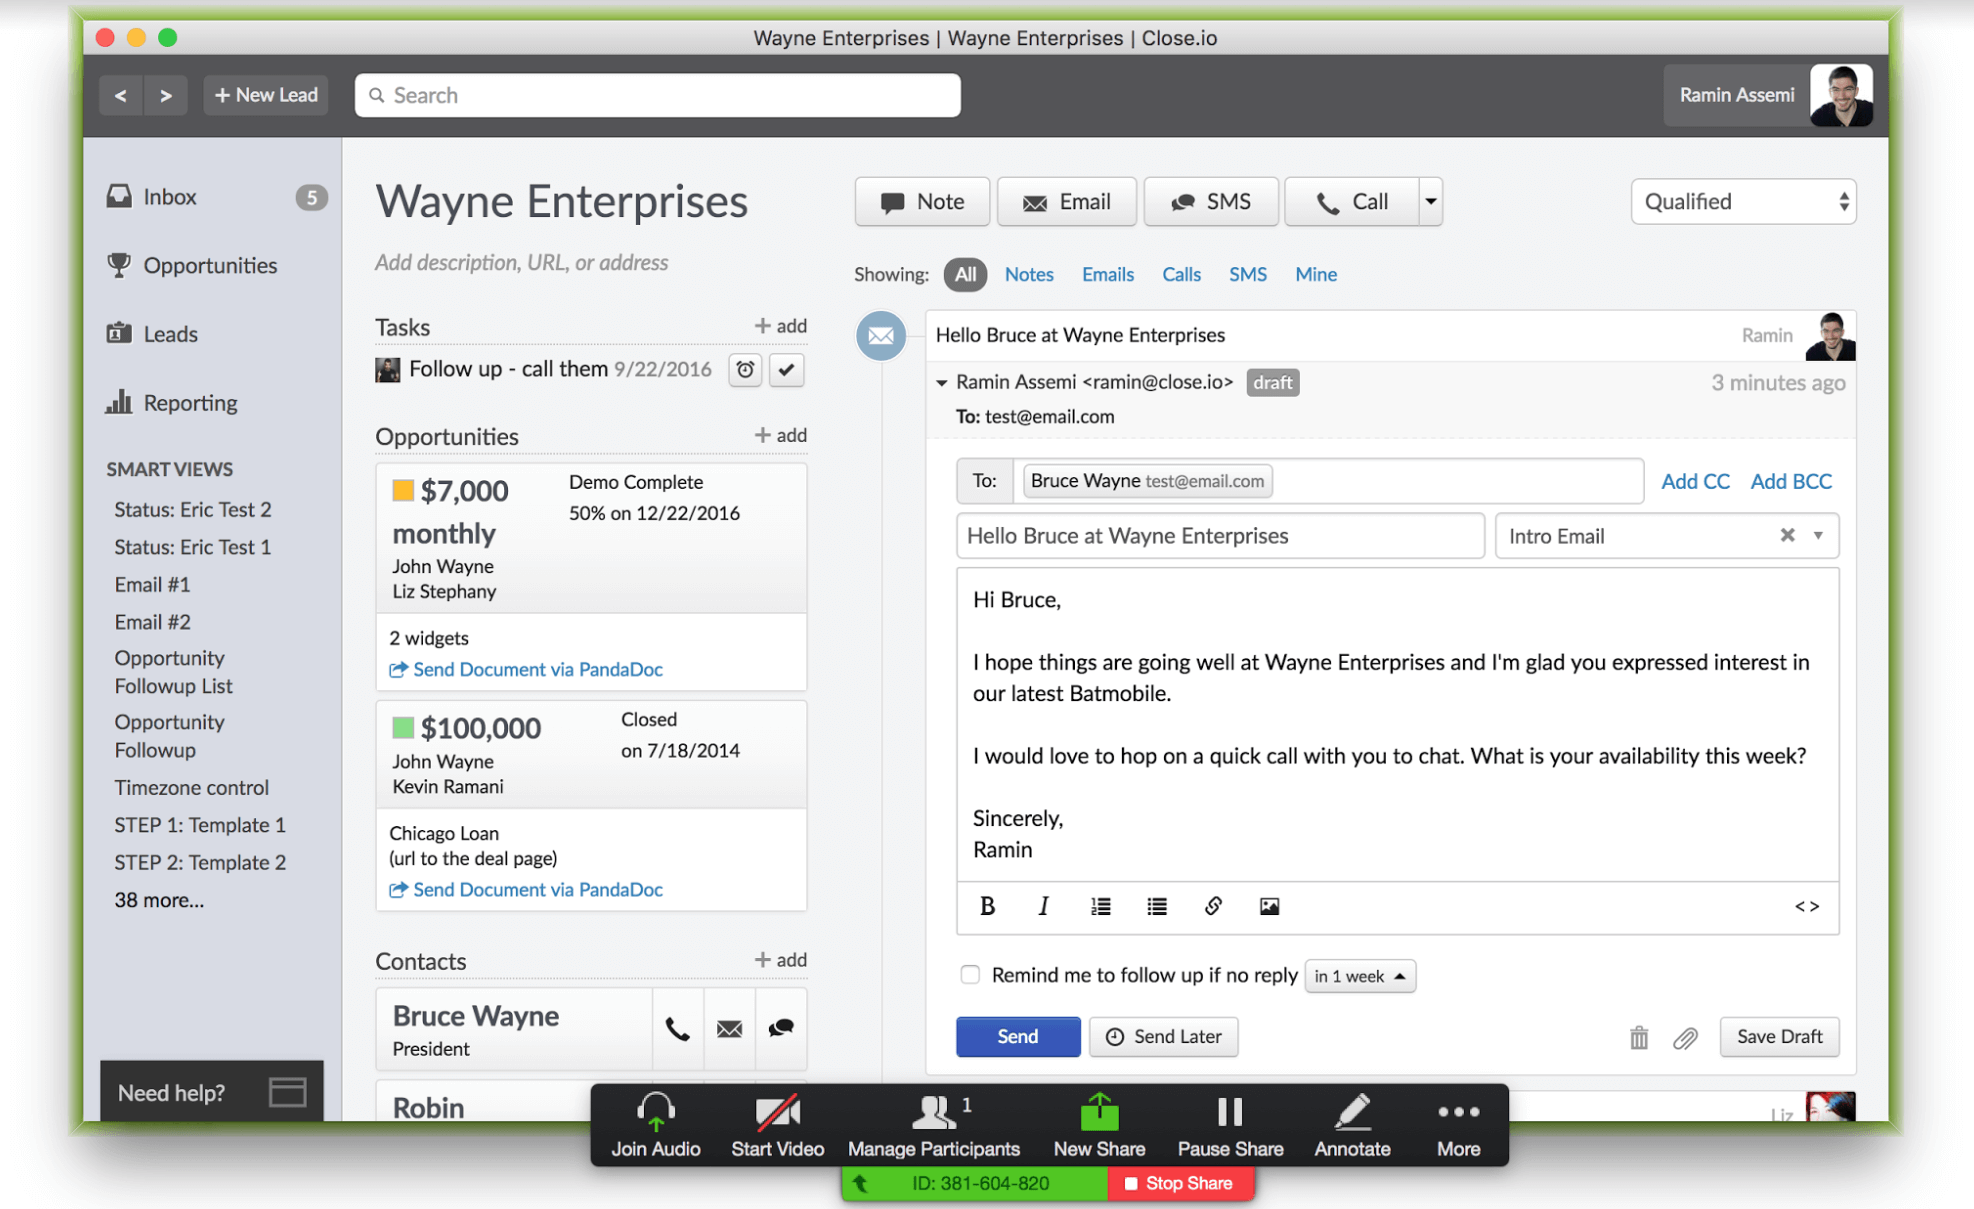 Wayne enterprises live demo